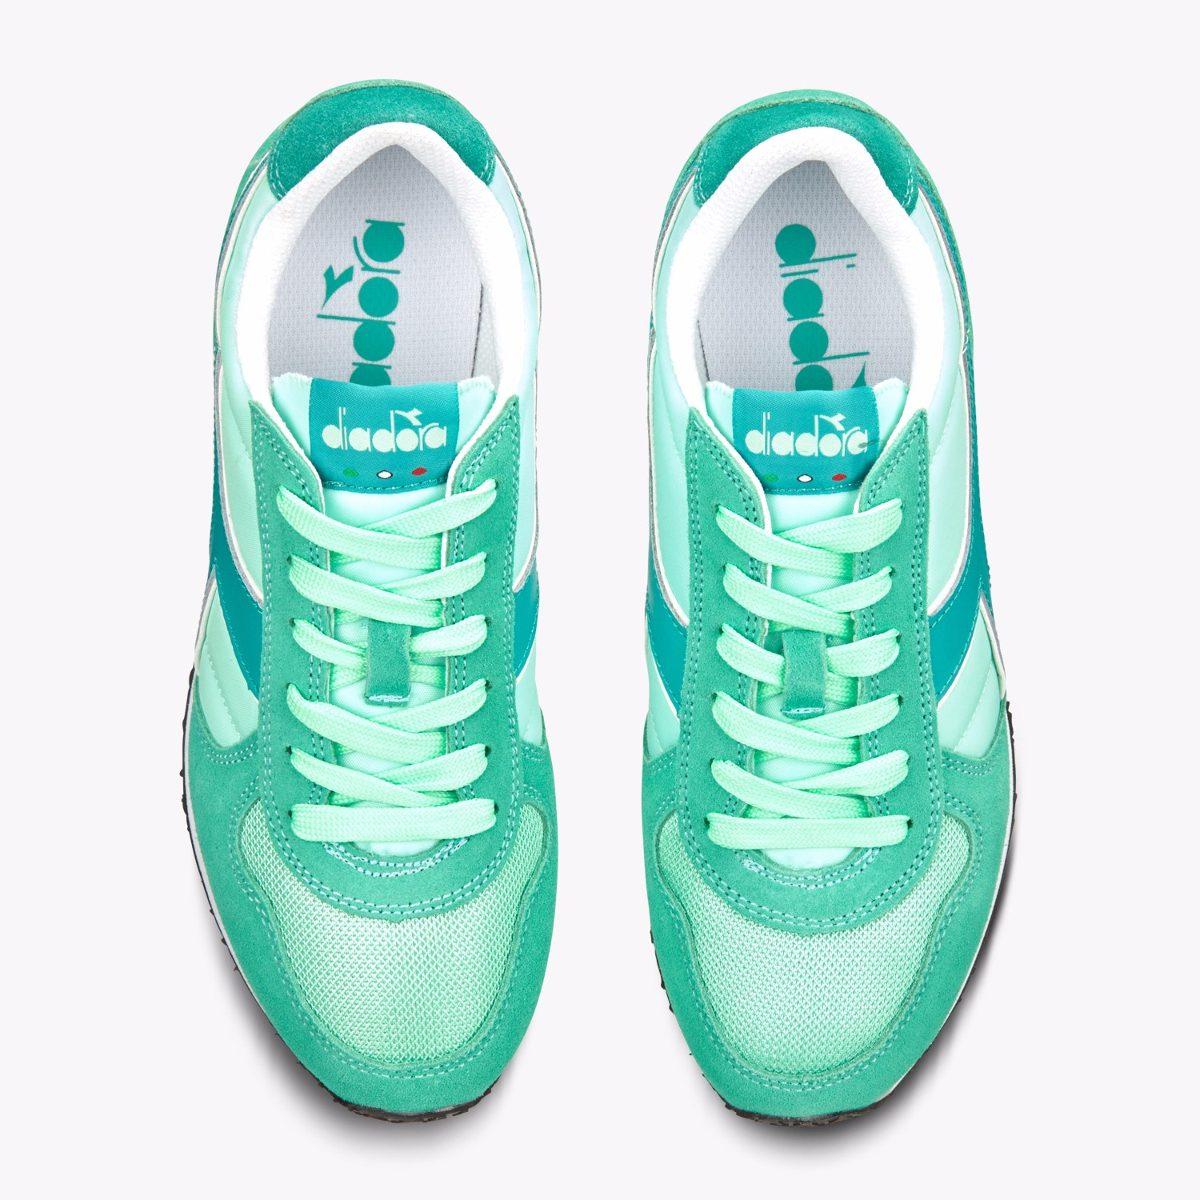 zapatilla retro running mujer diadora k run  brand sports. Cargando zoom. 74da76d5b54